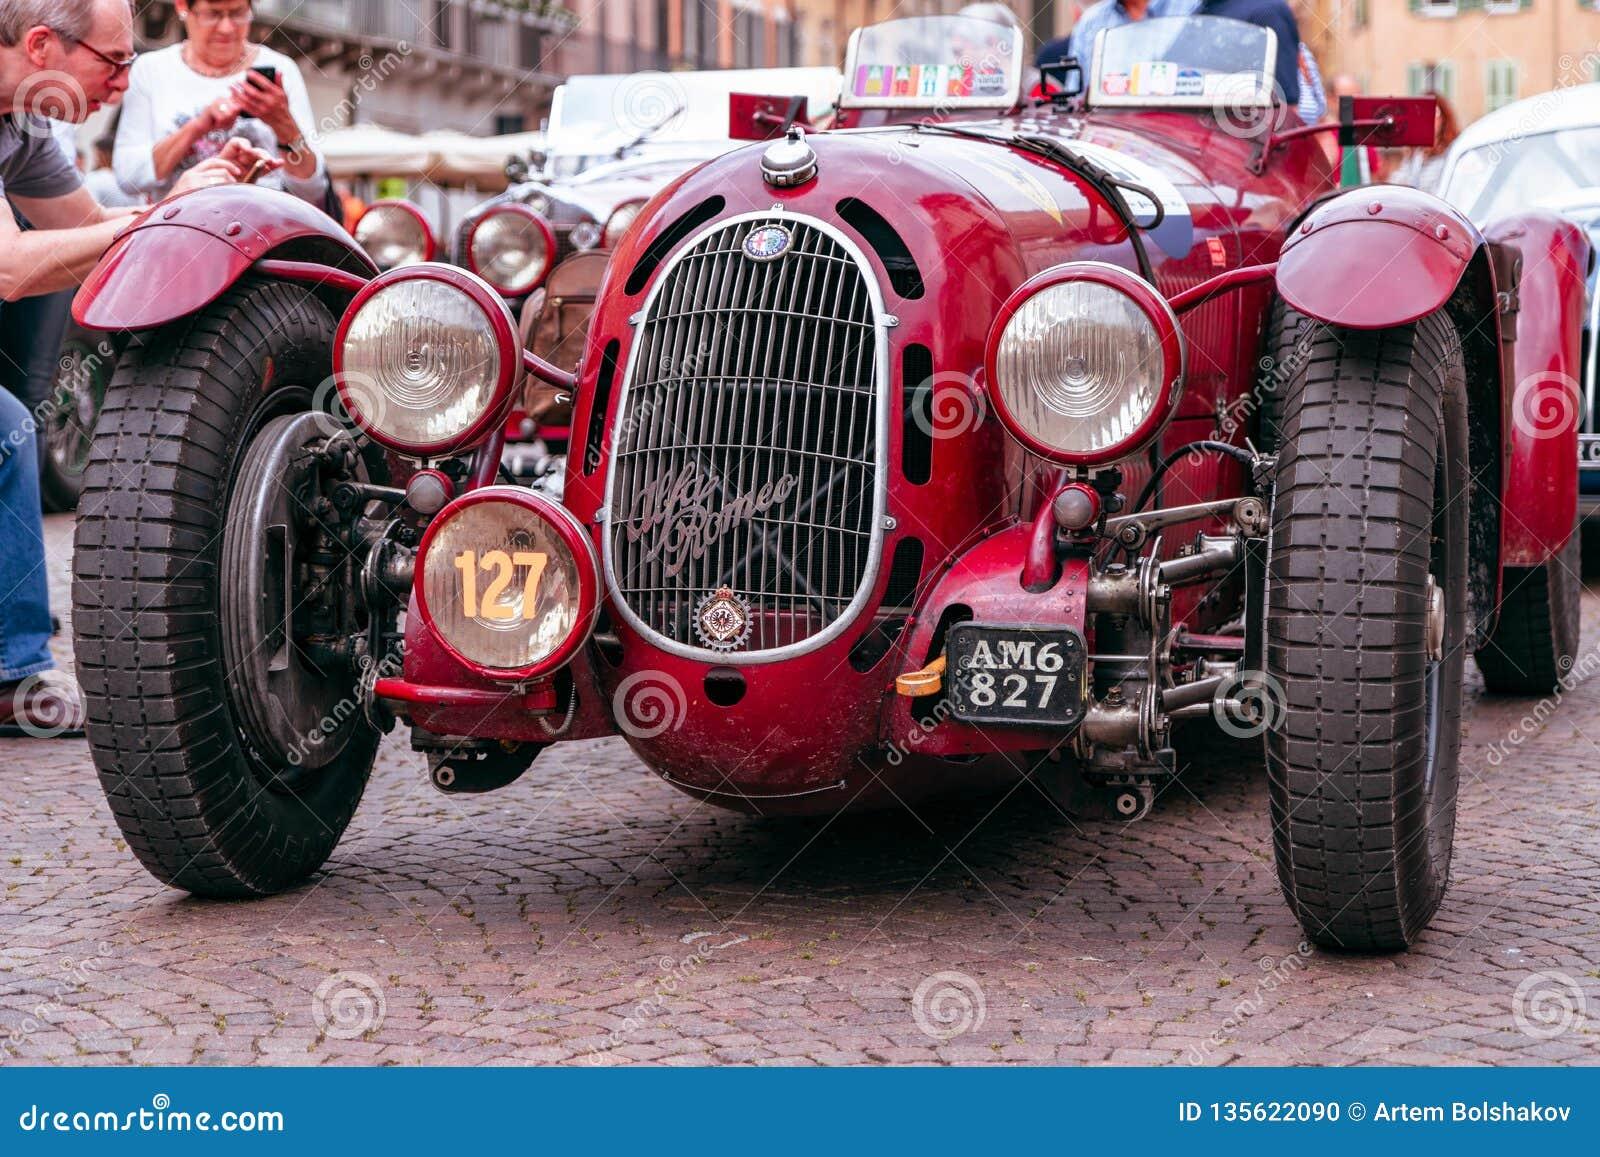 Miglia 1000 2017, Брешия - Италия 17-ое мая 2017: Исторические автогонки Mille Miglia Альфа Romeo 8c 2900 Botticella, год 1936